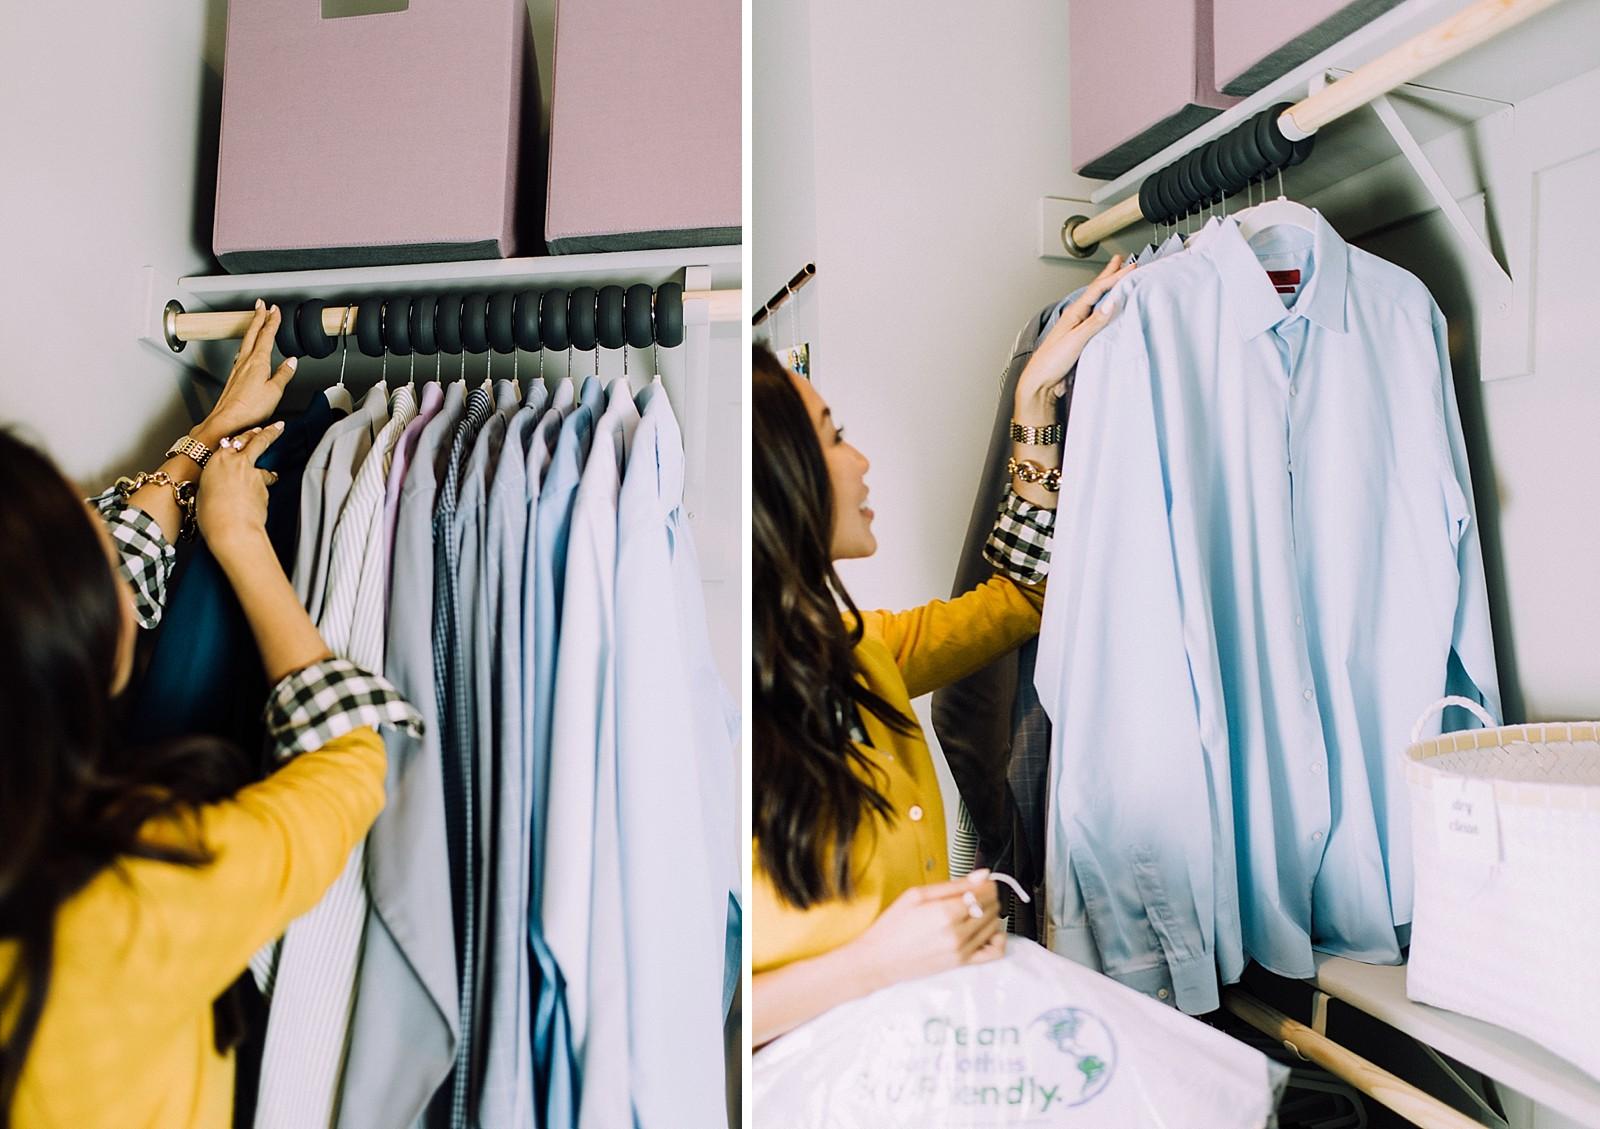 diana-elizabeth-blog-fashion-blogger-organized-closet-xanger-spacers-hanger_0026